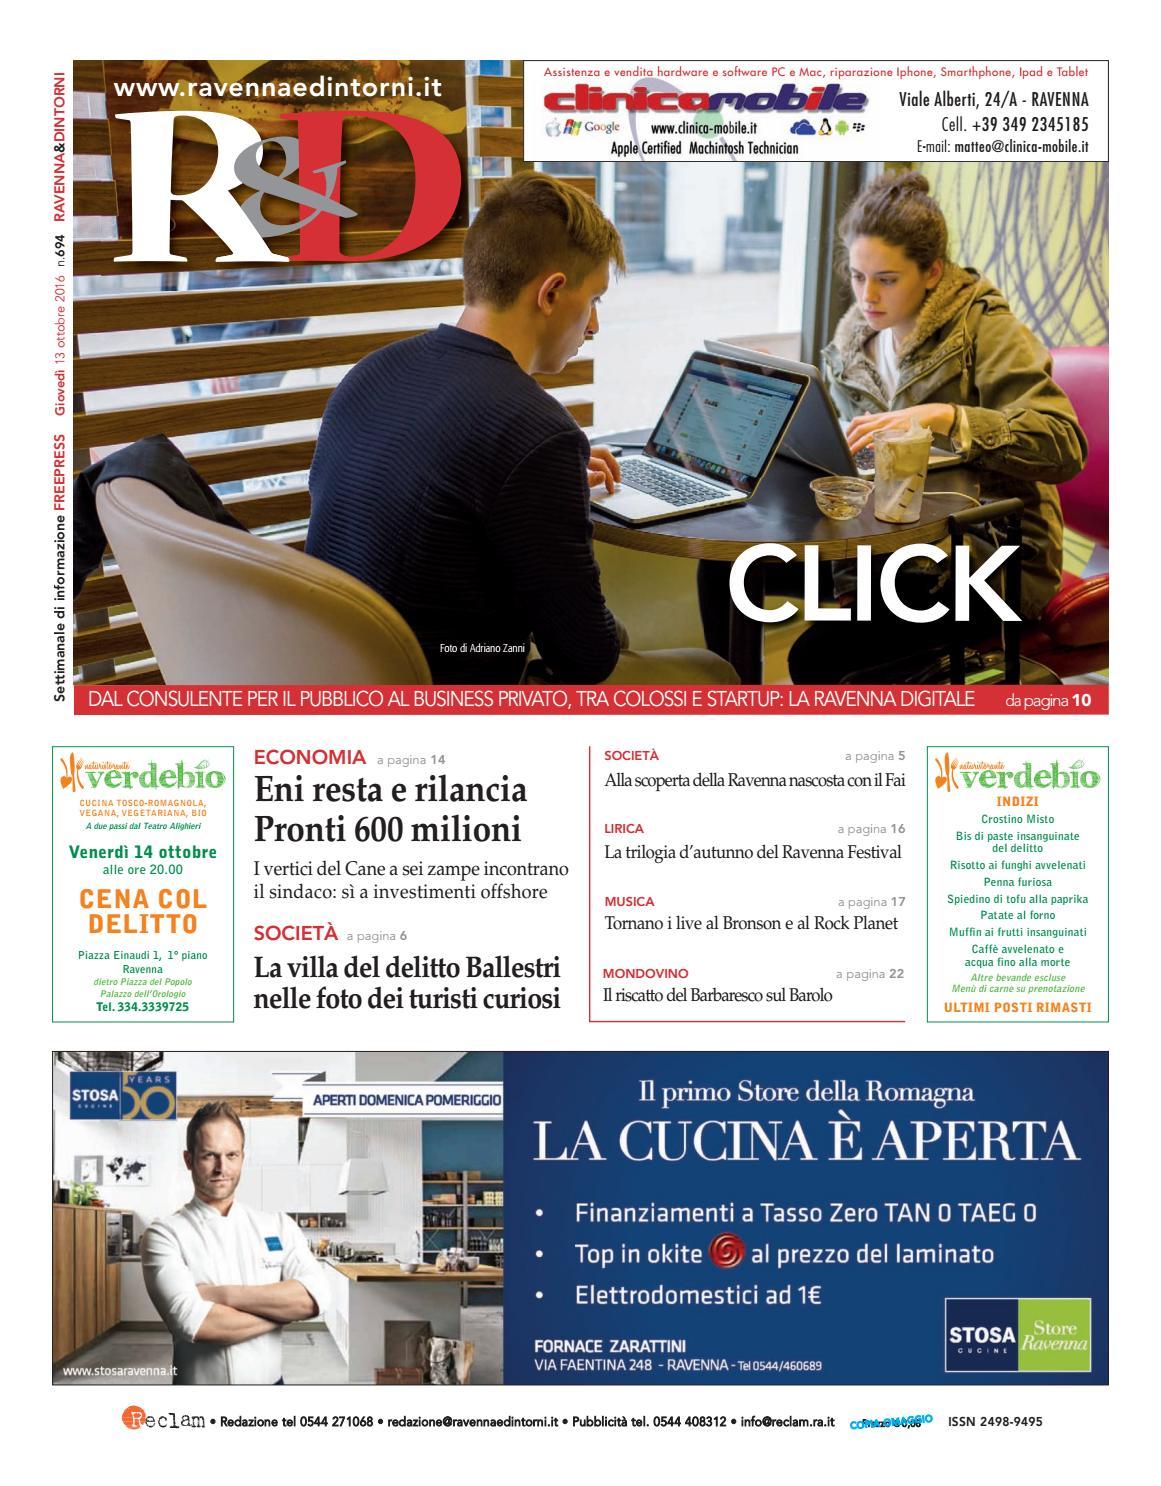 Okite Pregi E Difetti rd 13 10 16 by reclam edizioni e comunicazione - issuu